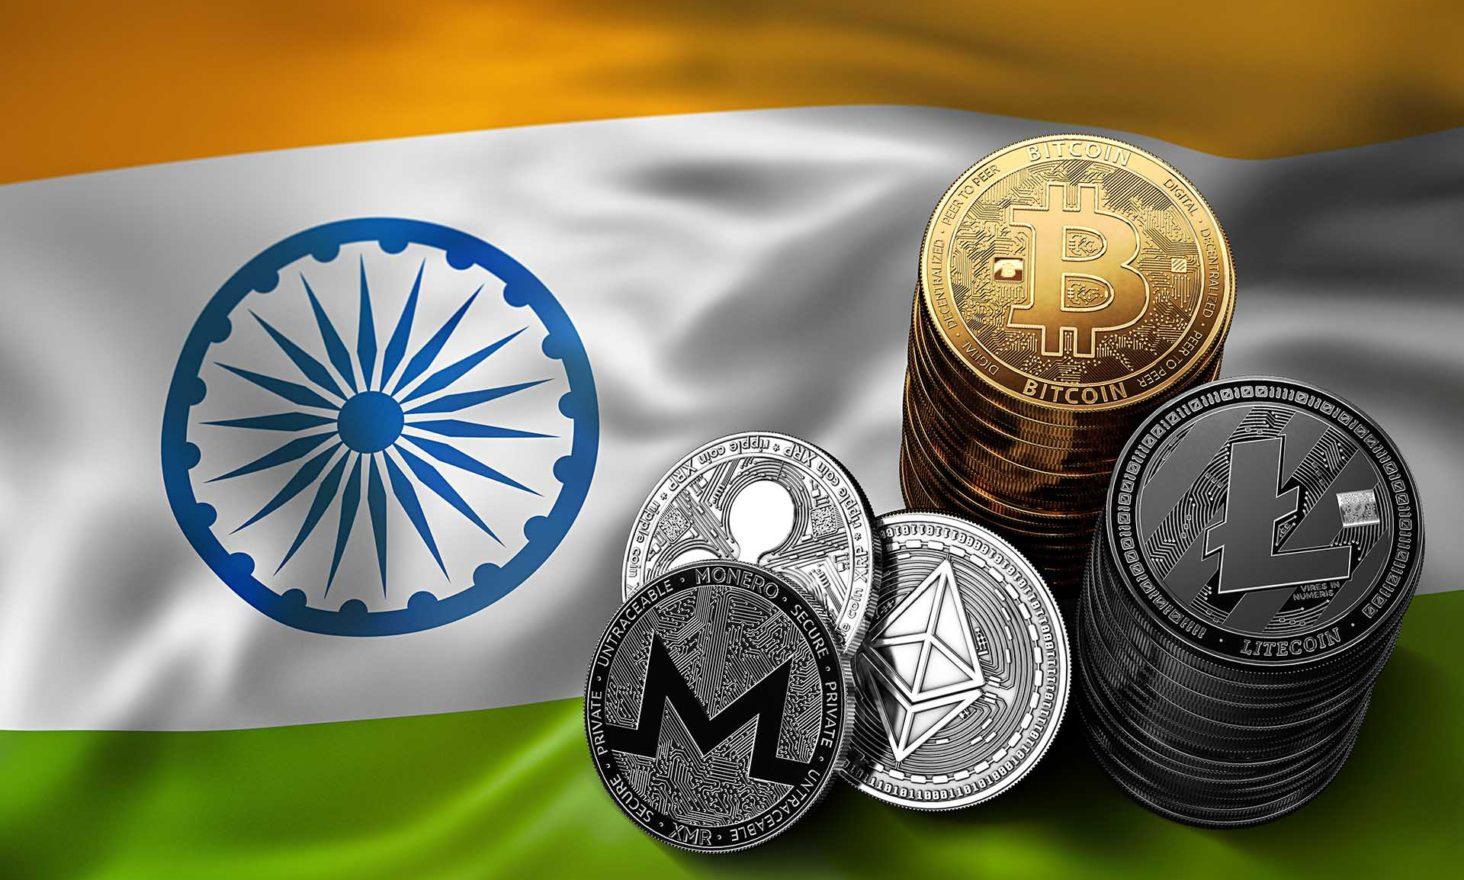 Crowdfire Founder Nischal Shetty to Launch India's WazirX Bitcoin Exchange